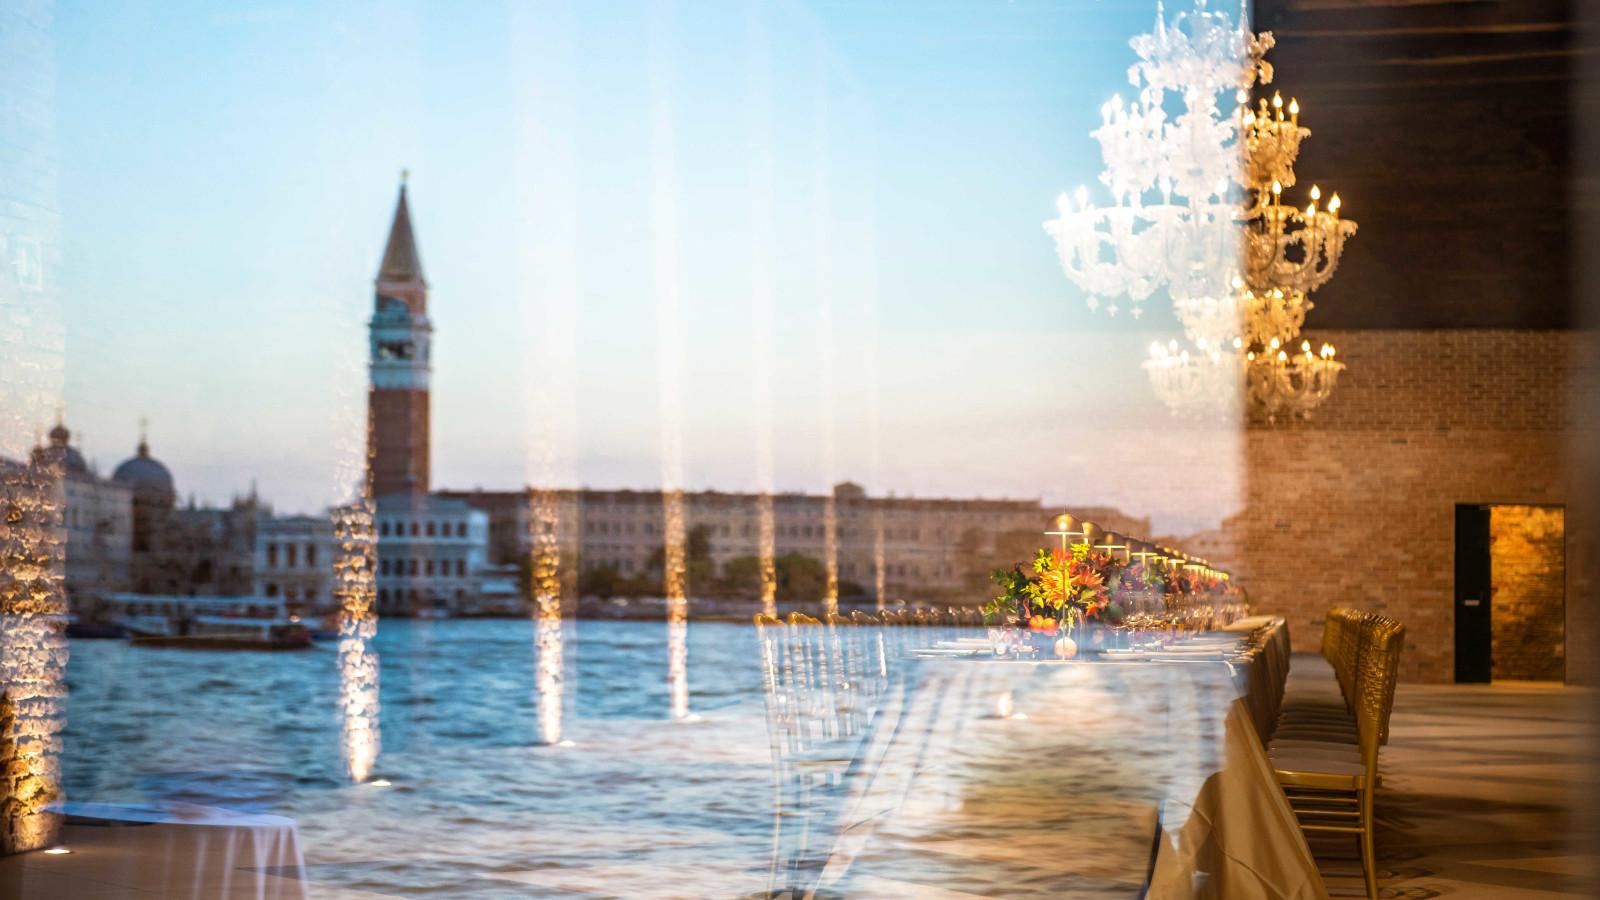 VENICE---Benedetta-Malavasi---Italy---Vanity-Fair-Venice-Film-Festival-small